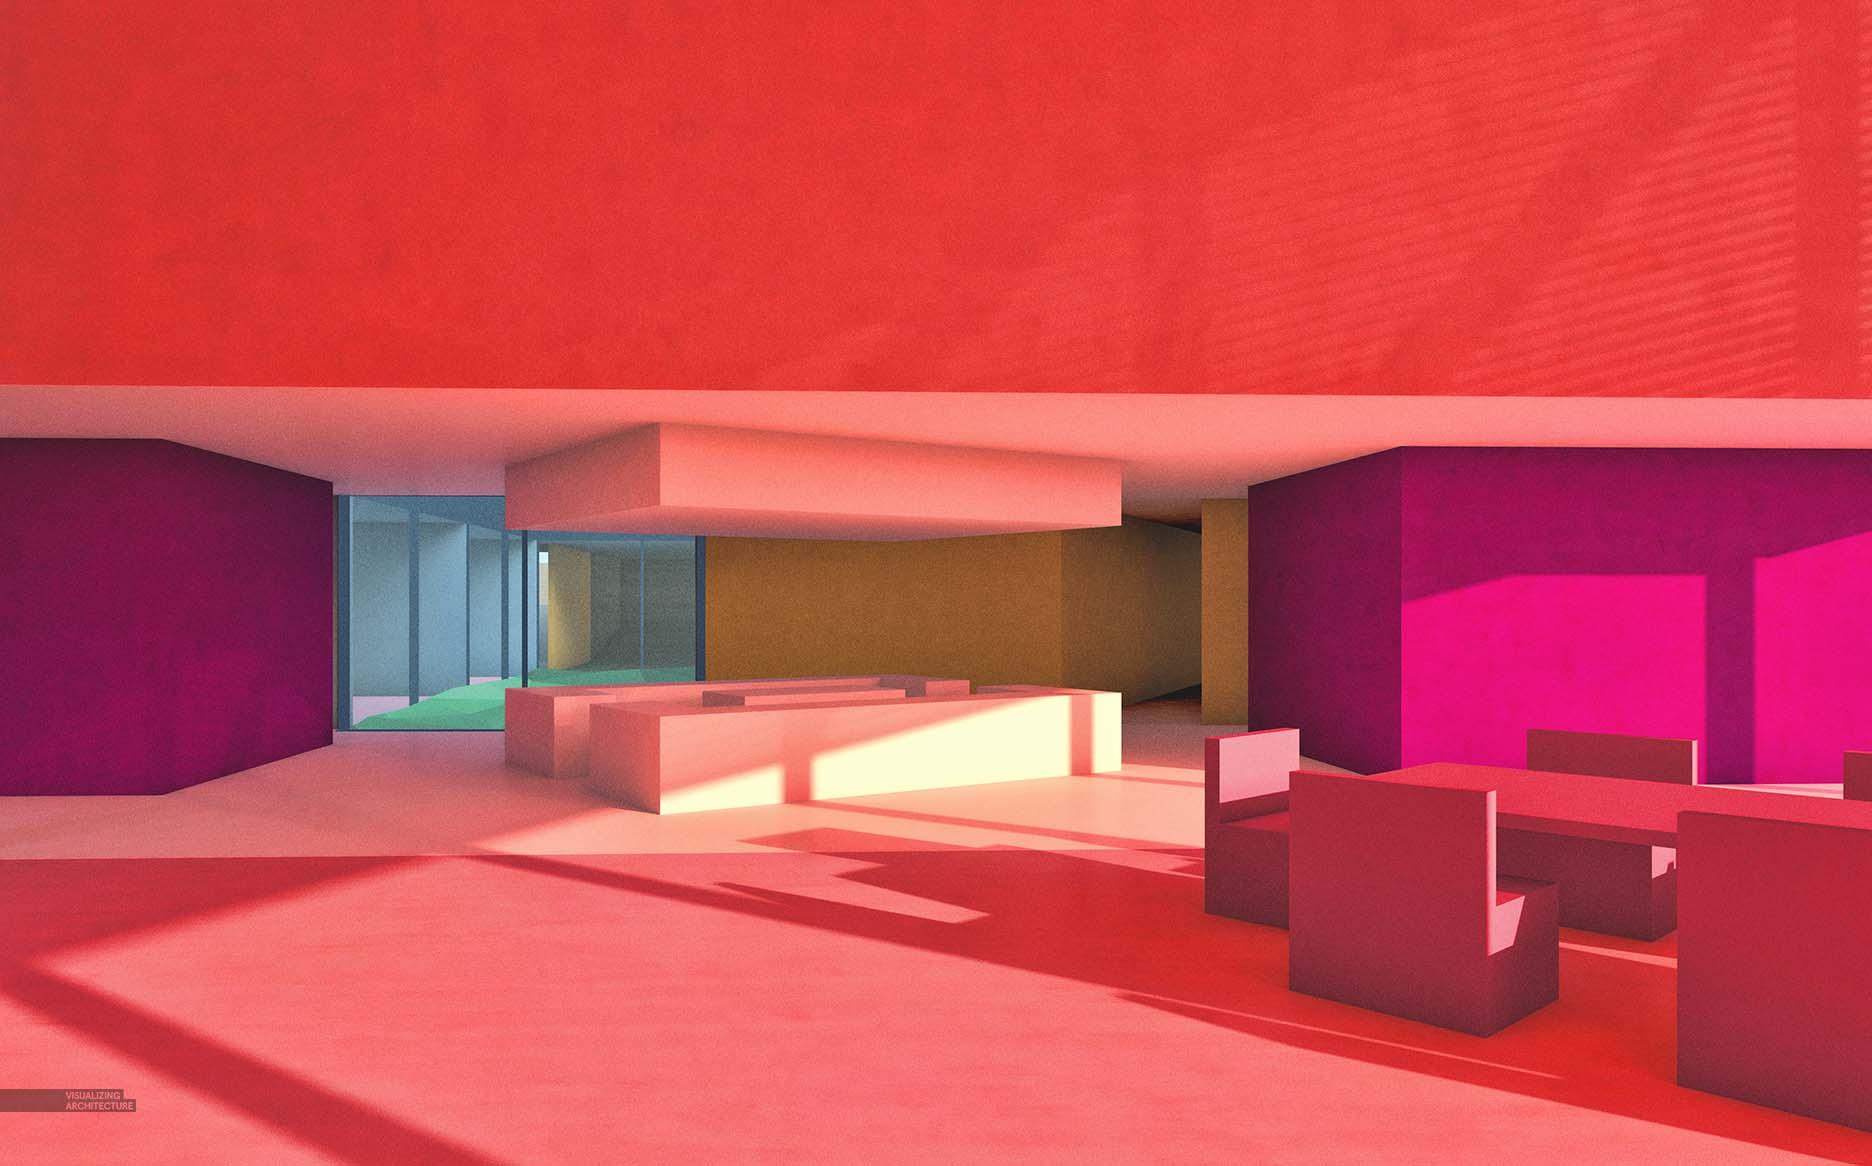 All Tutorials | Visualizing Architecture